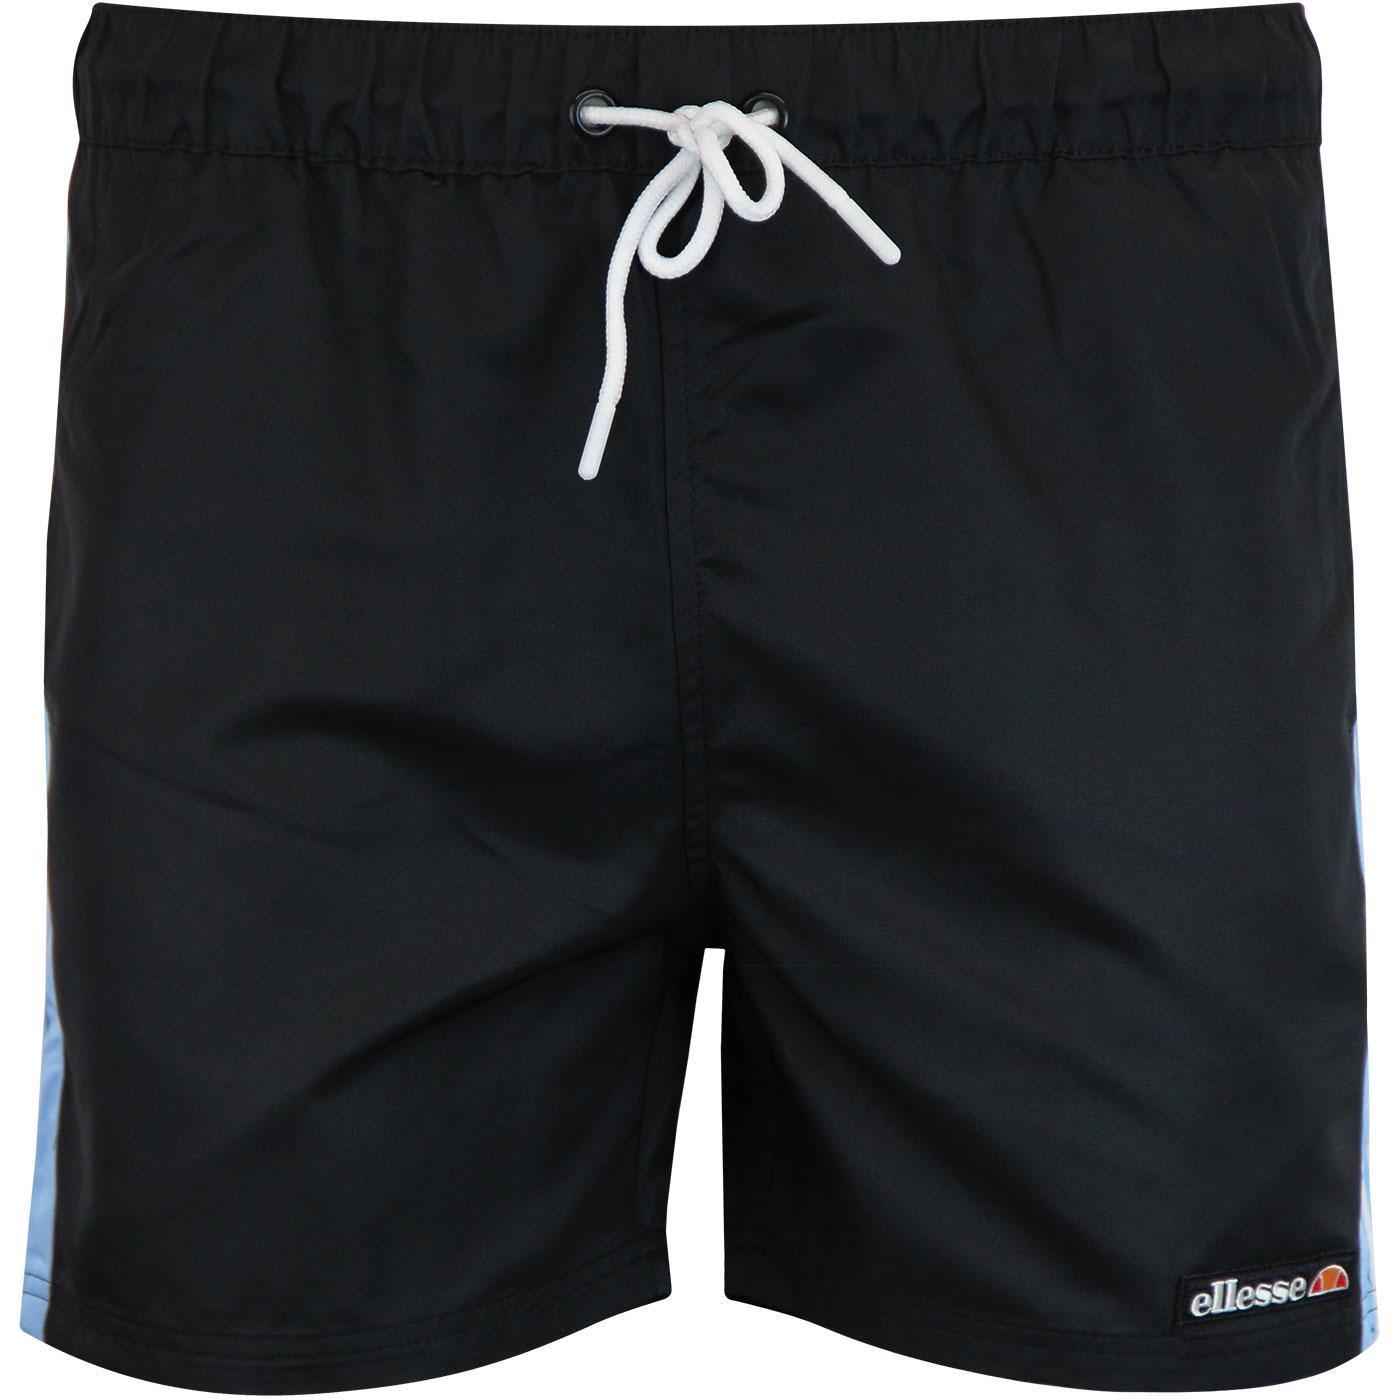 Apiro ELLESSE Retro 80s Stripes Swimshorts BLACK